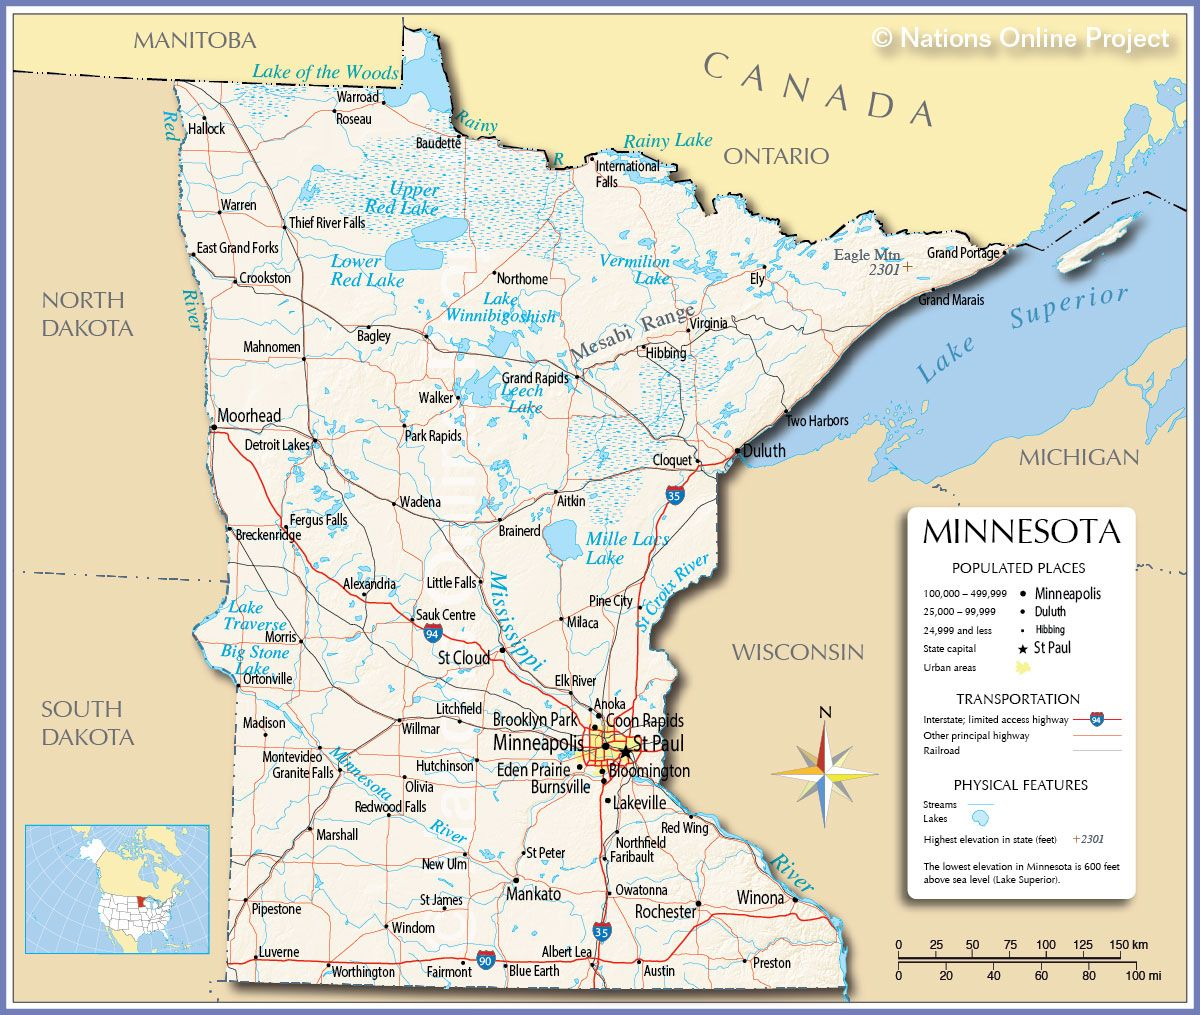 Reference Map Of Minnesota MN Pinterest The Washington Times - Minneapolis minnesota on us map